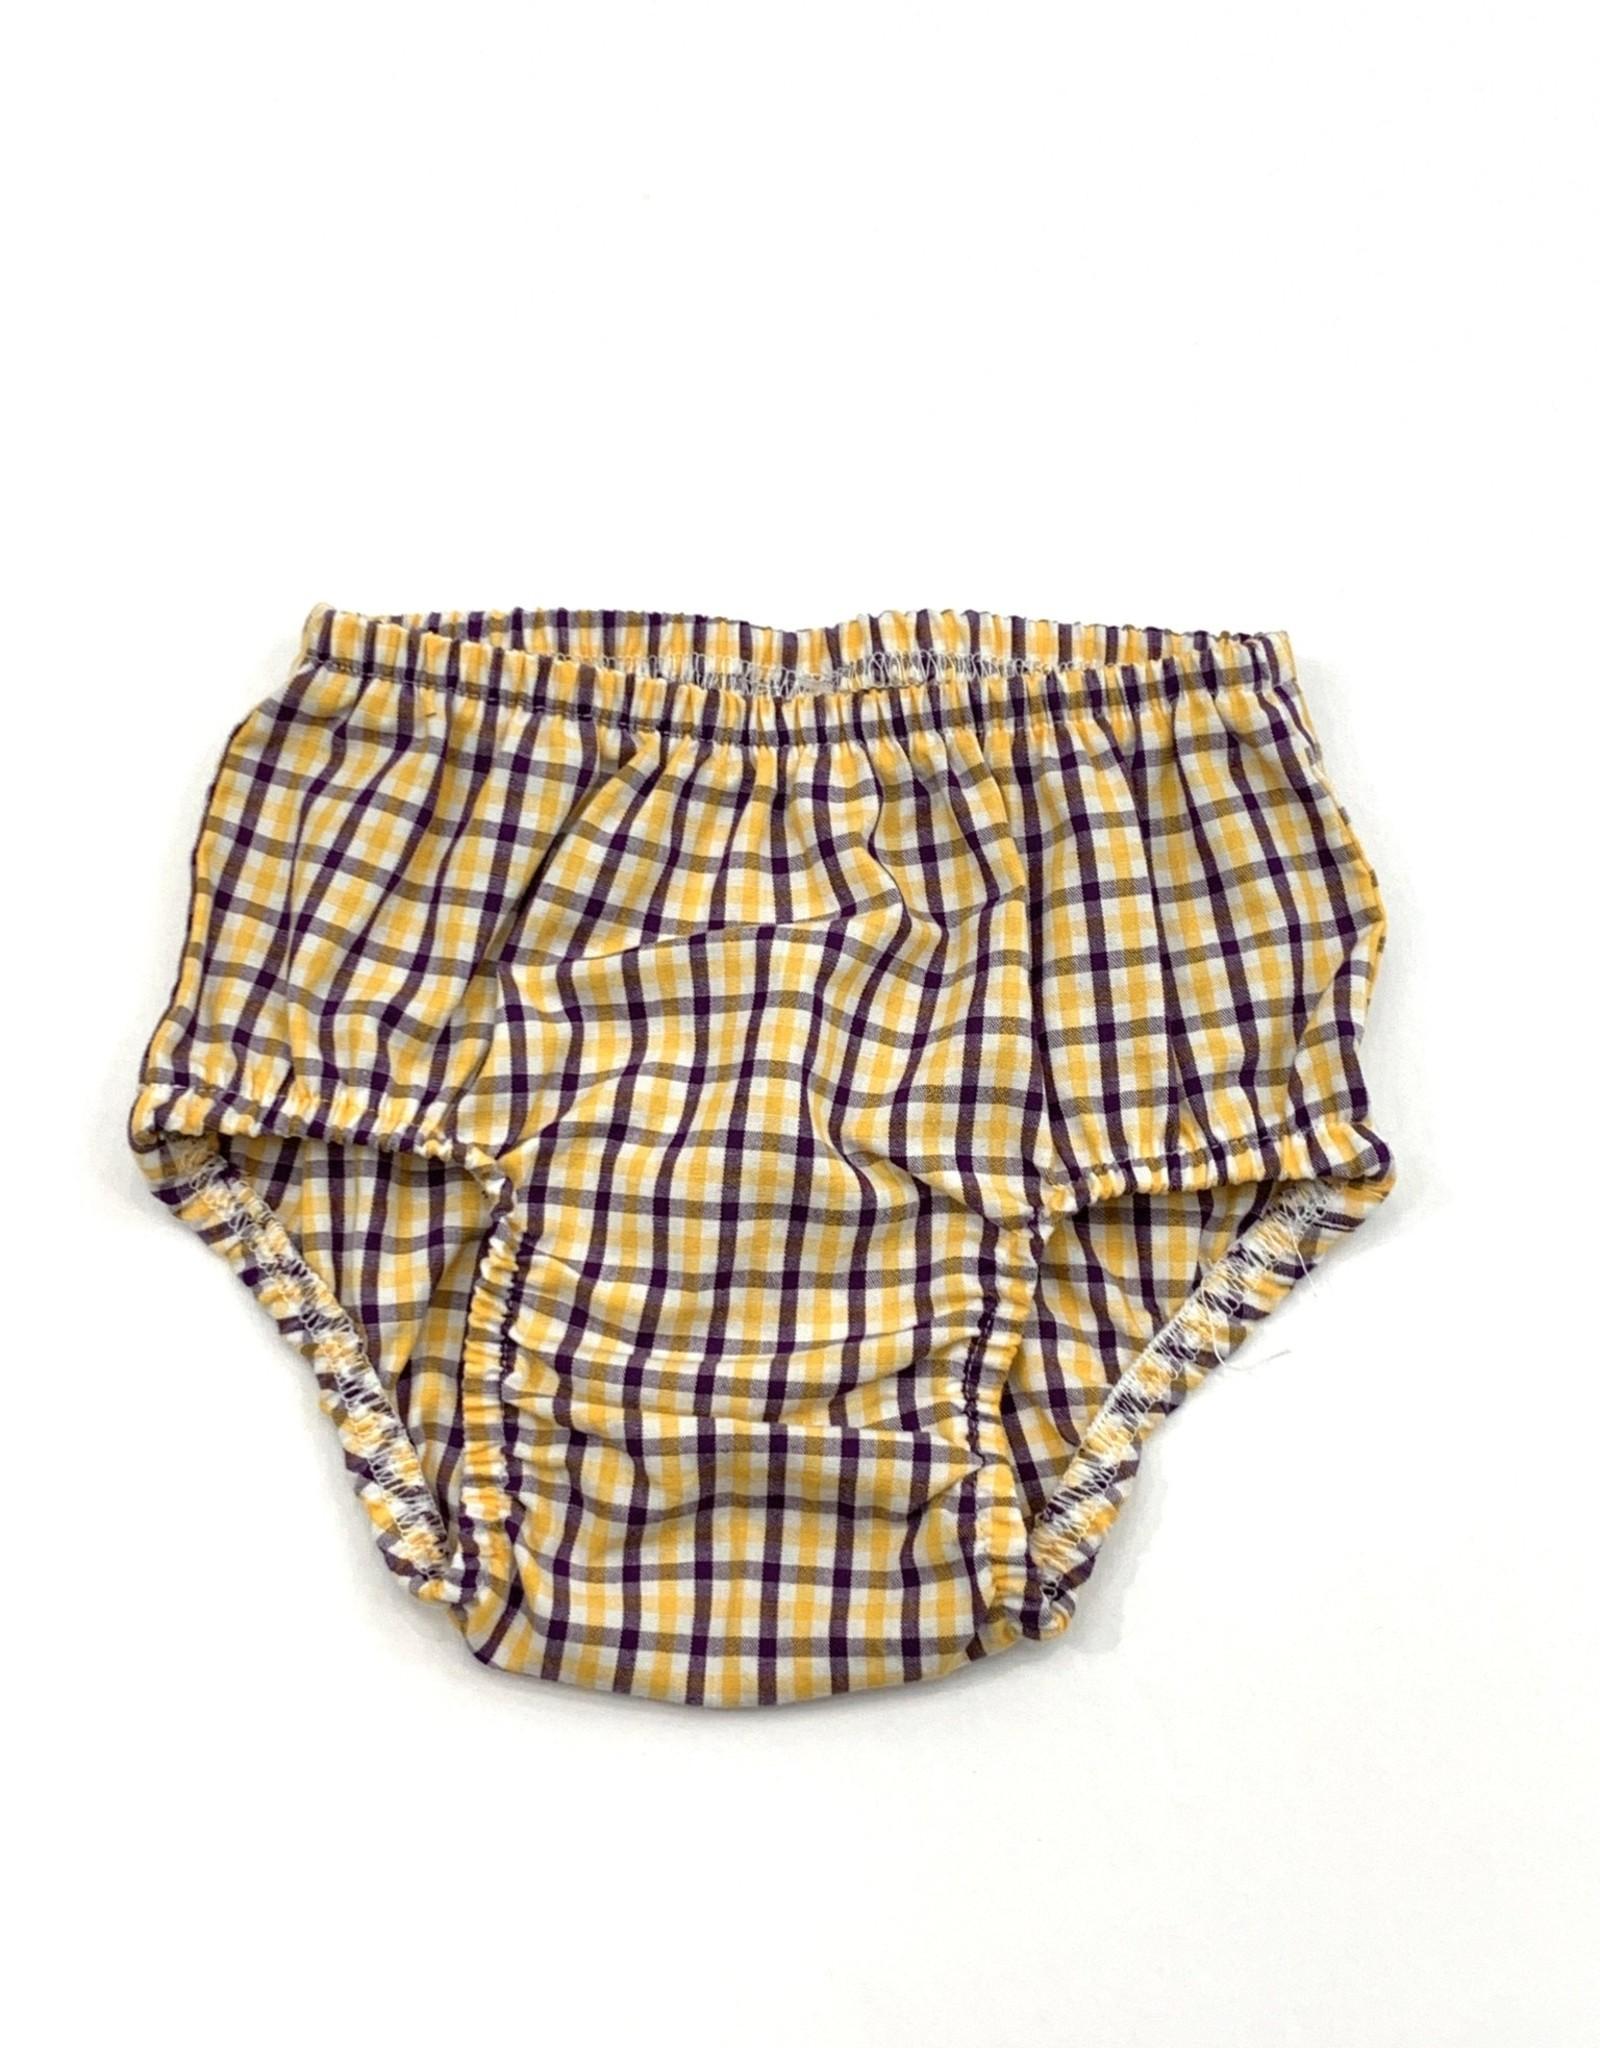 Funstyle LSU diaper cover